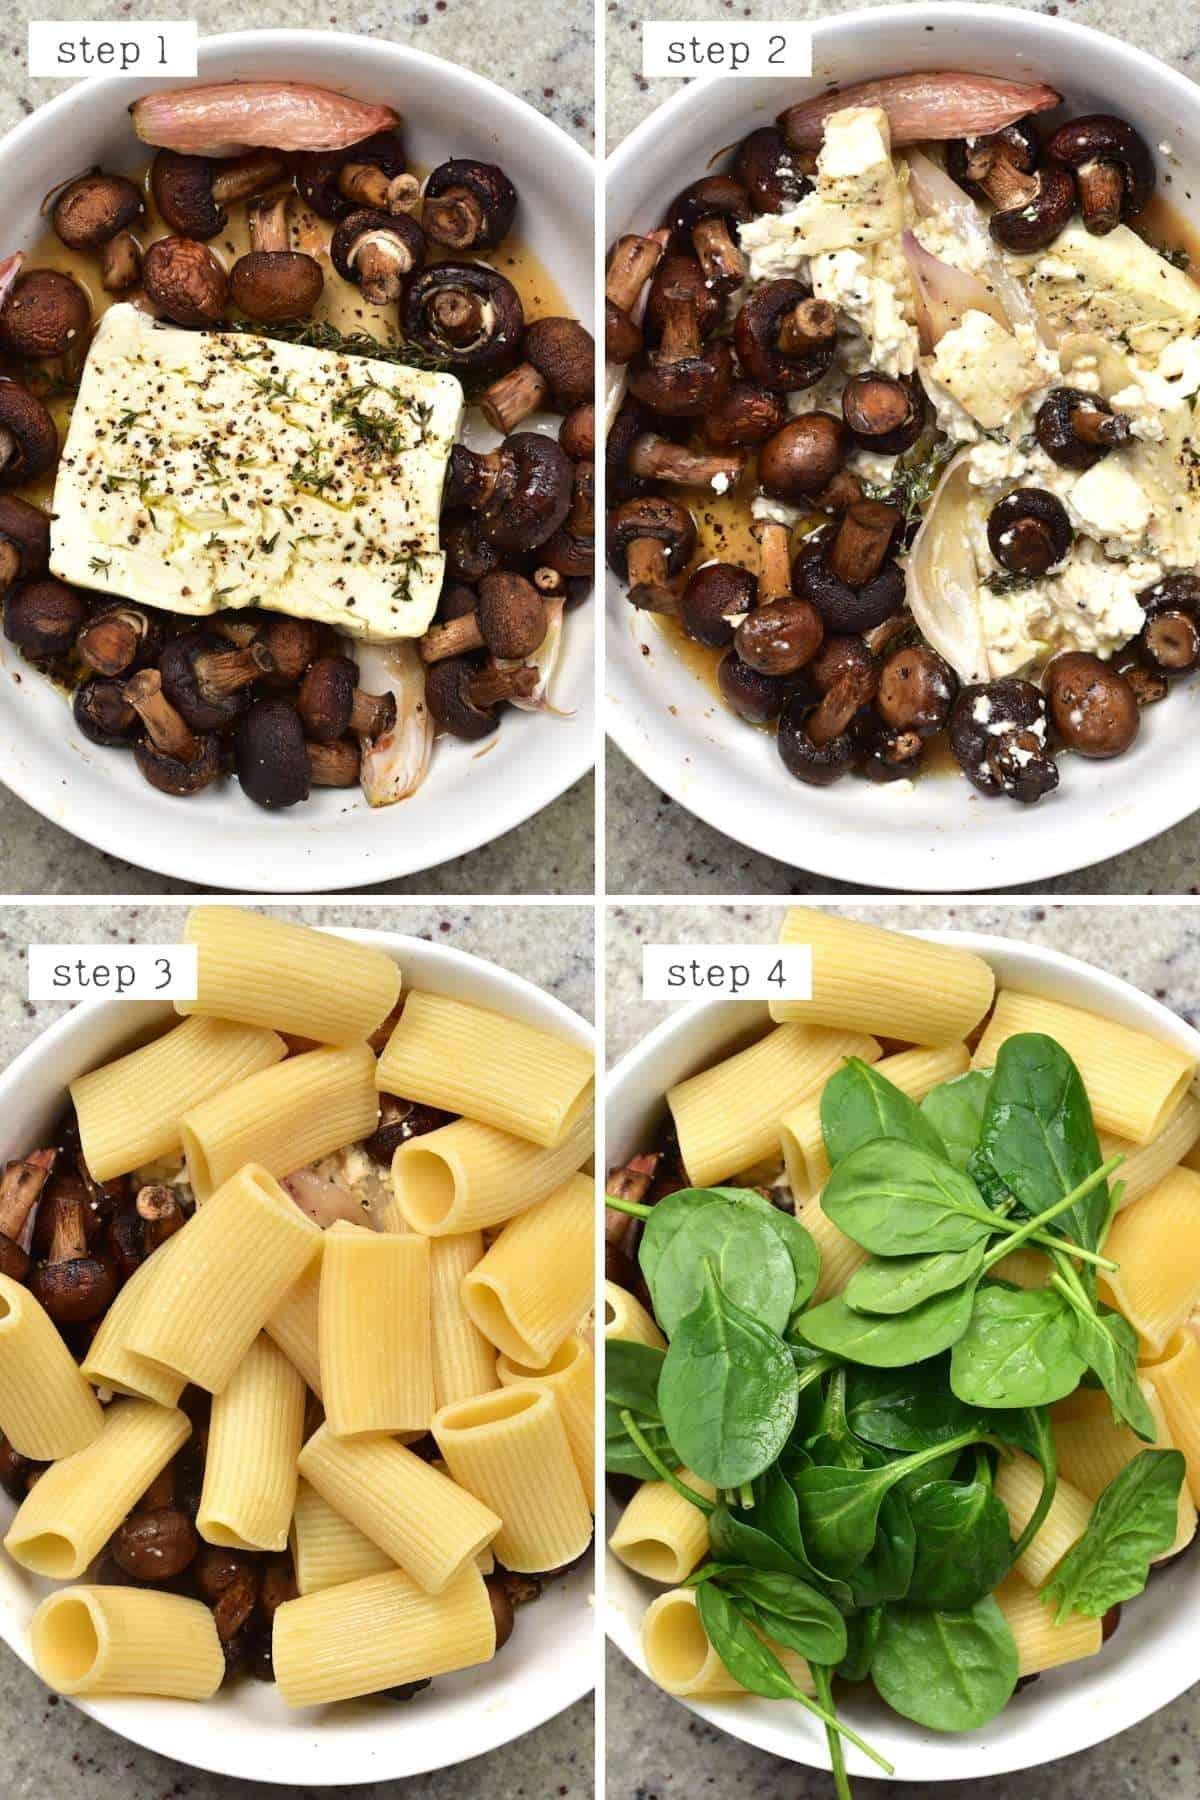 Steps for mixing mushroom feta pasta